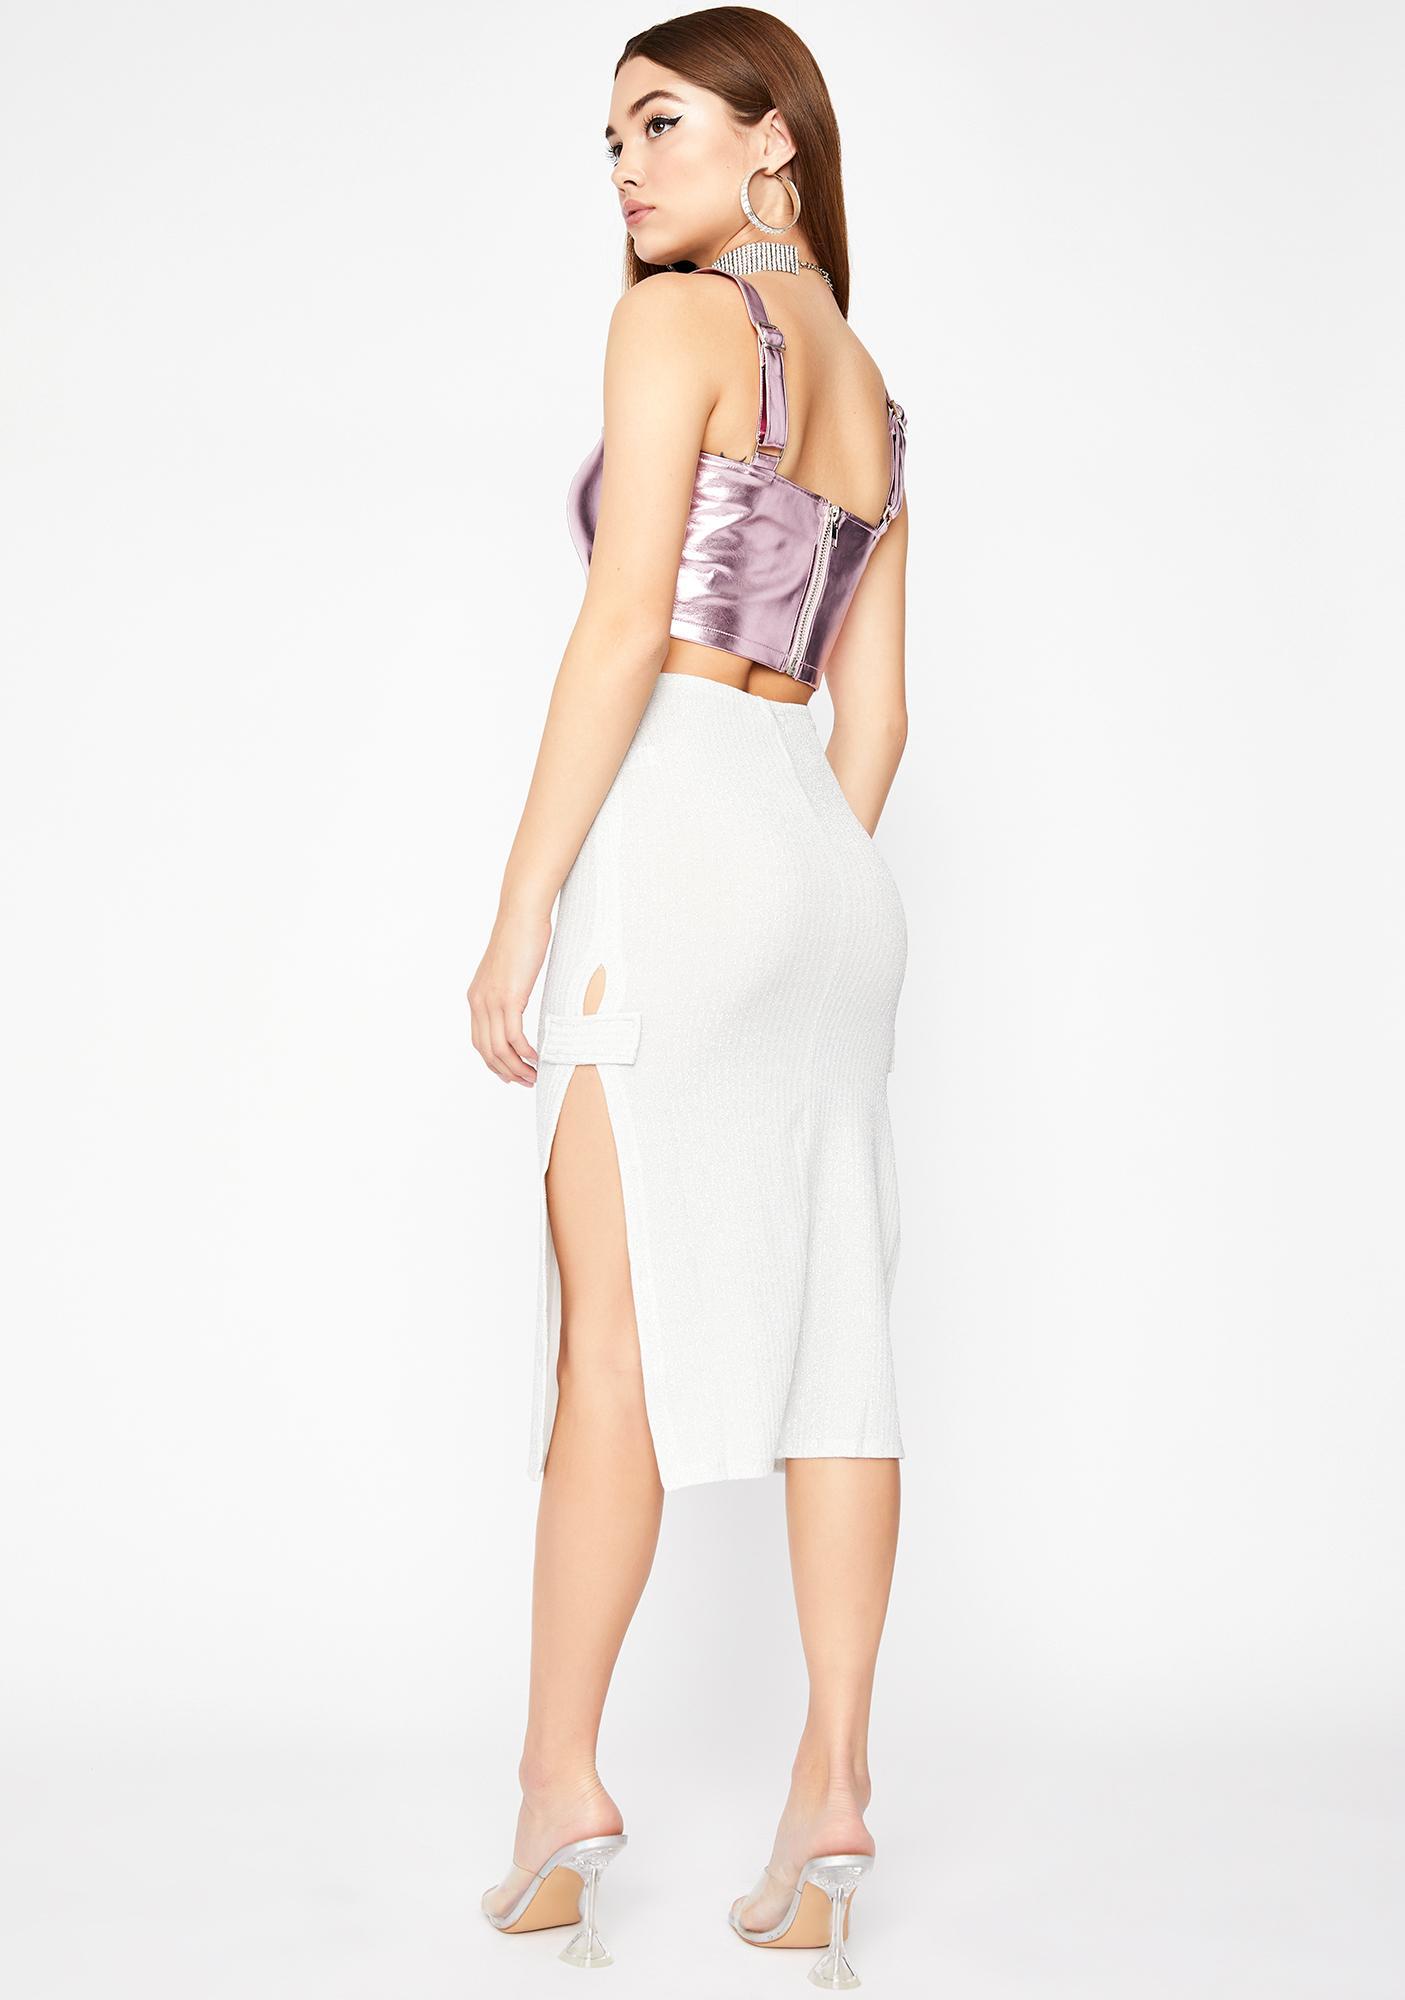 Chrome Kiss My Glam Midi Skirt